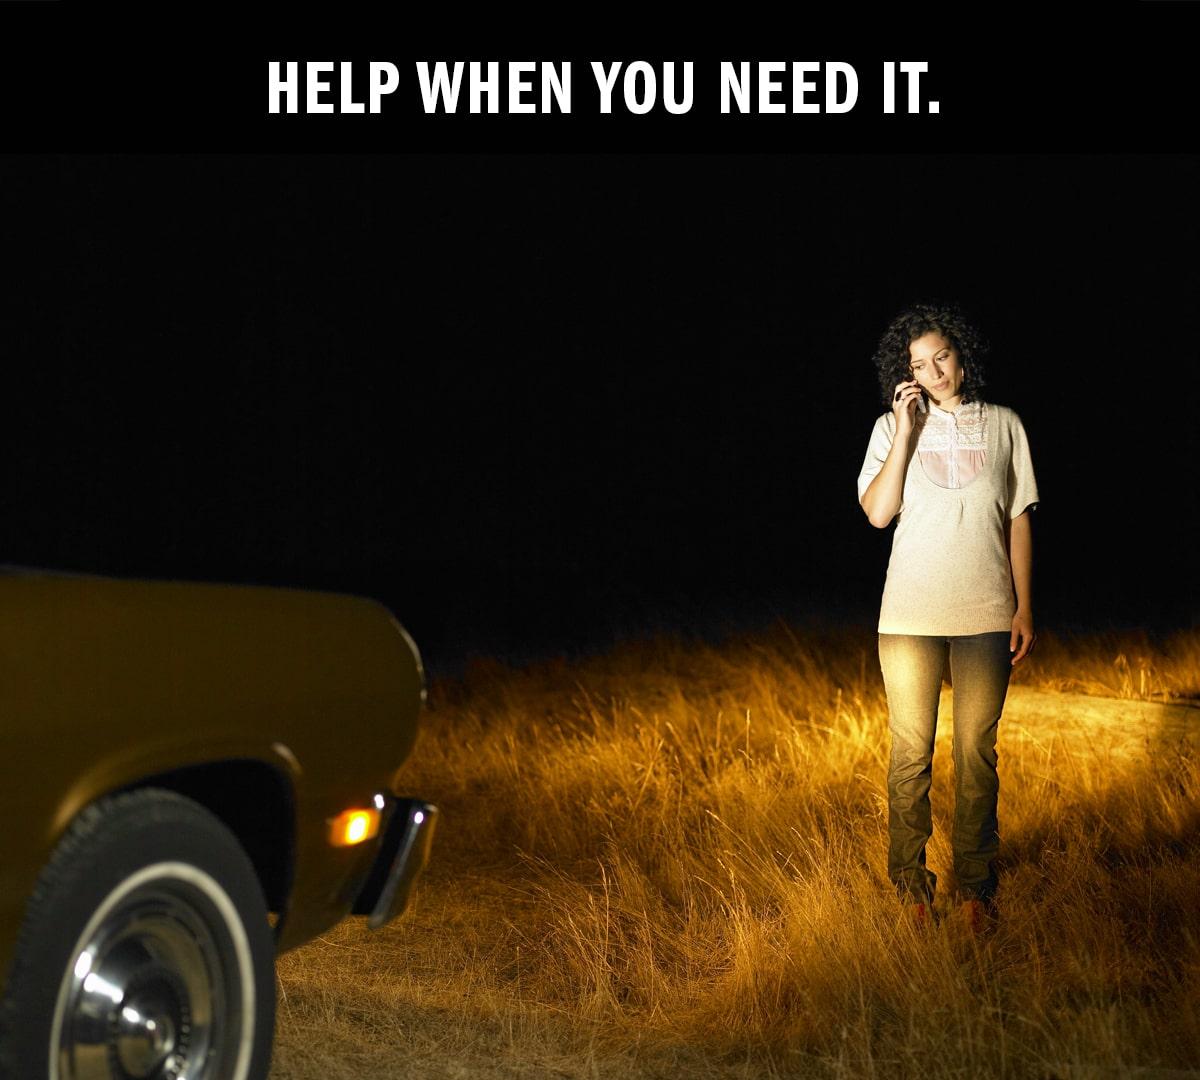 roadside-assistance-downtown-los-angeles-door-locked